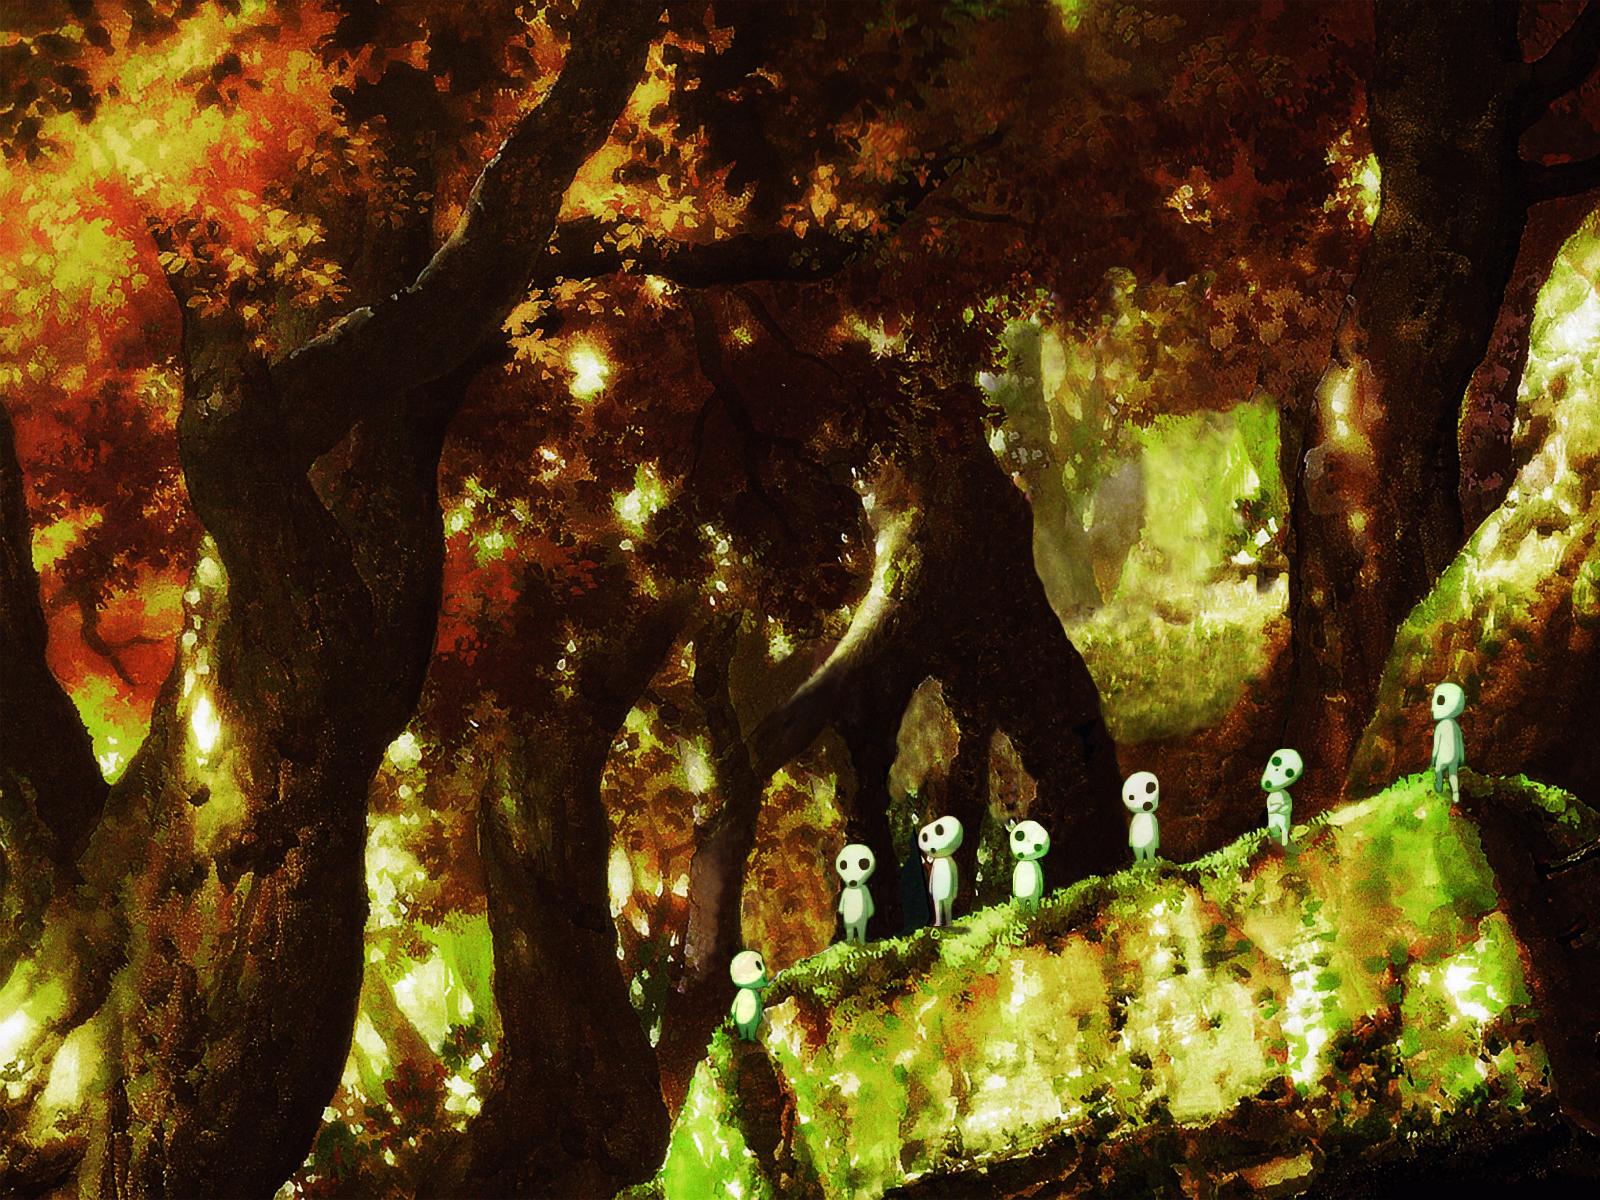 Princess mononoke wallpaper and background image - Mononoke anime wallpaper ...